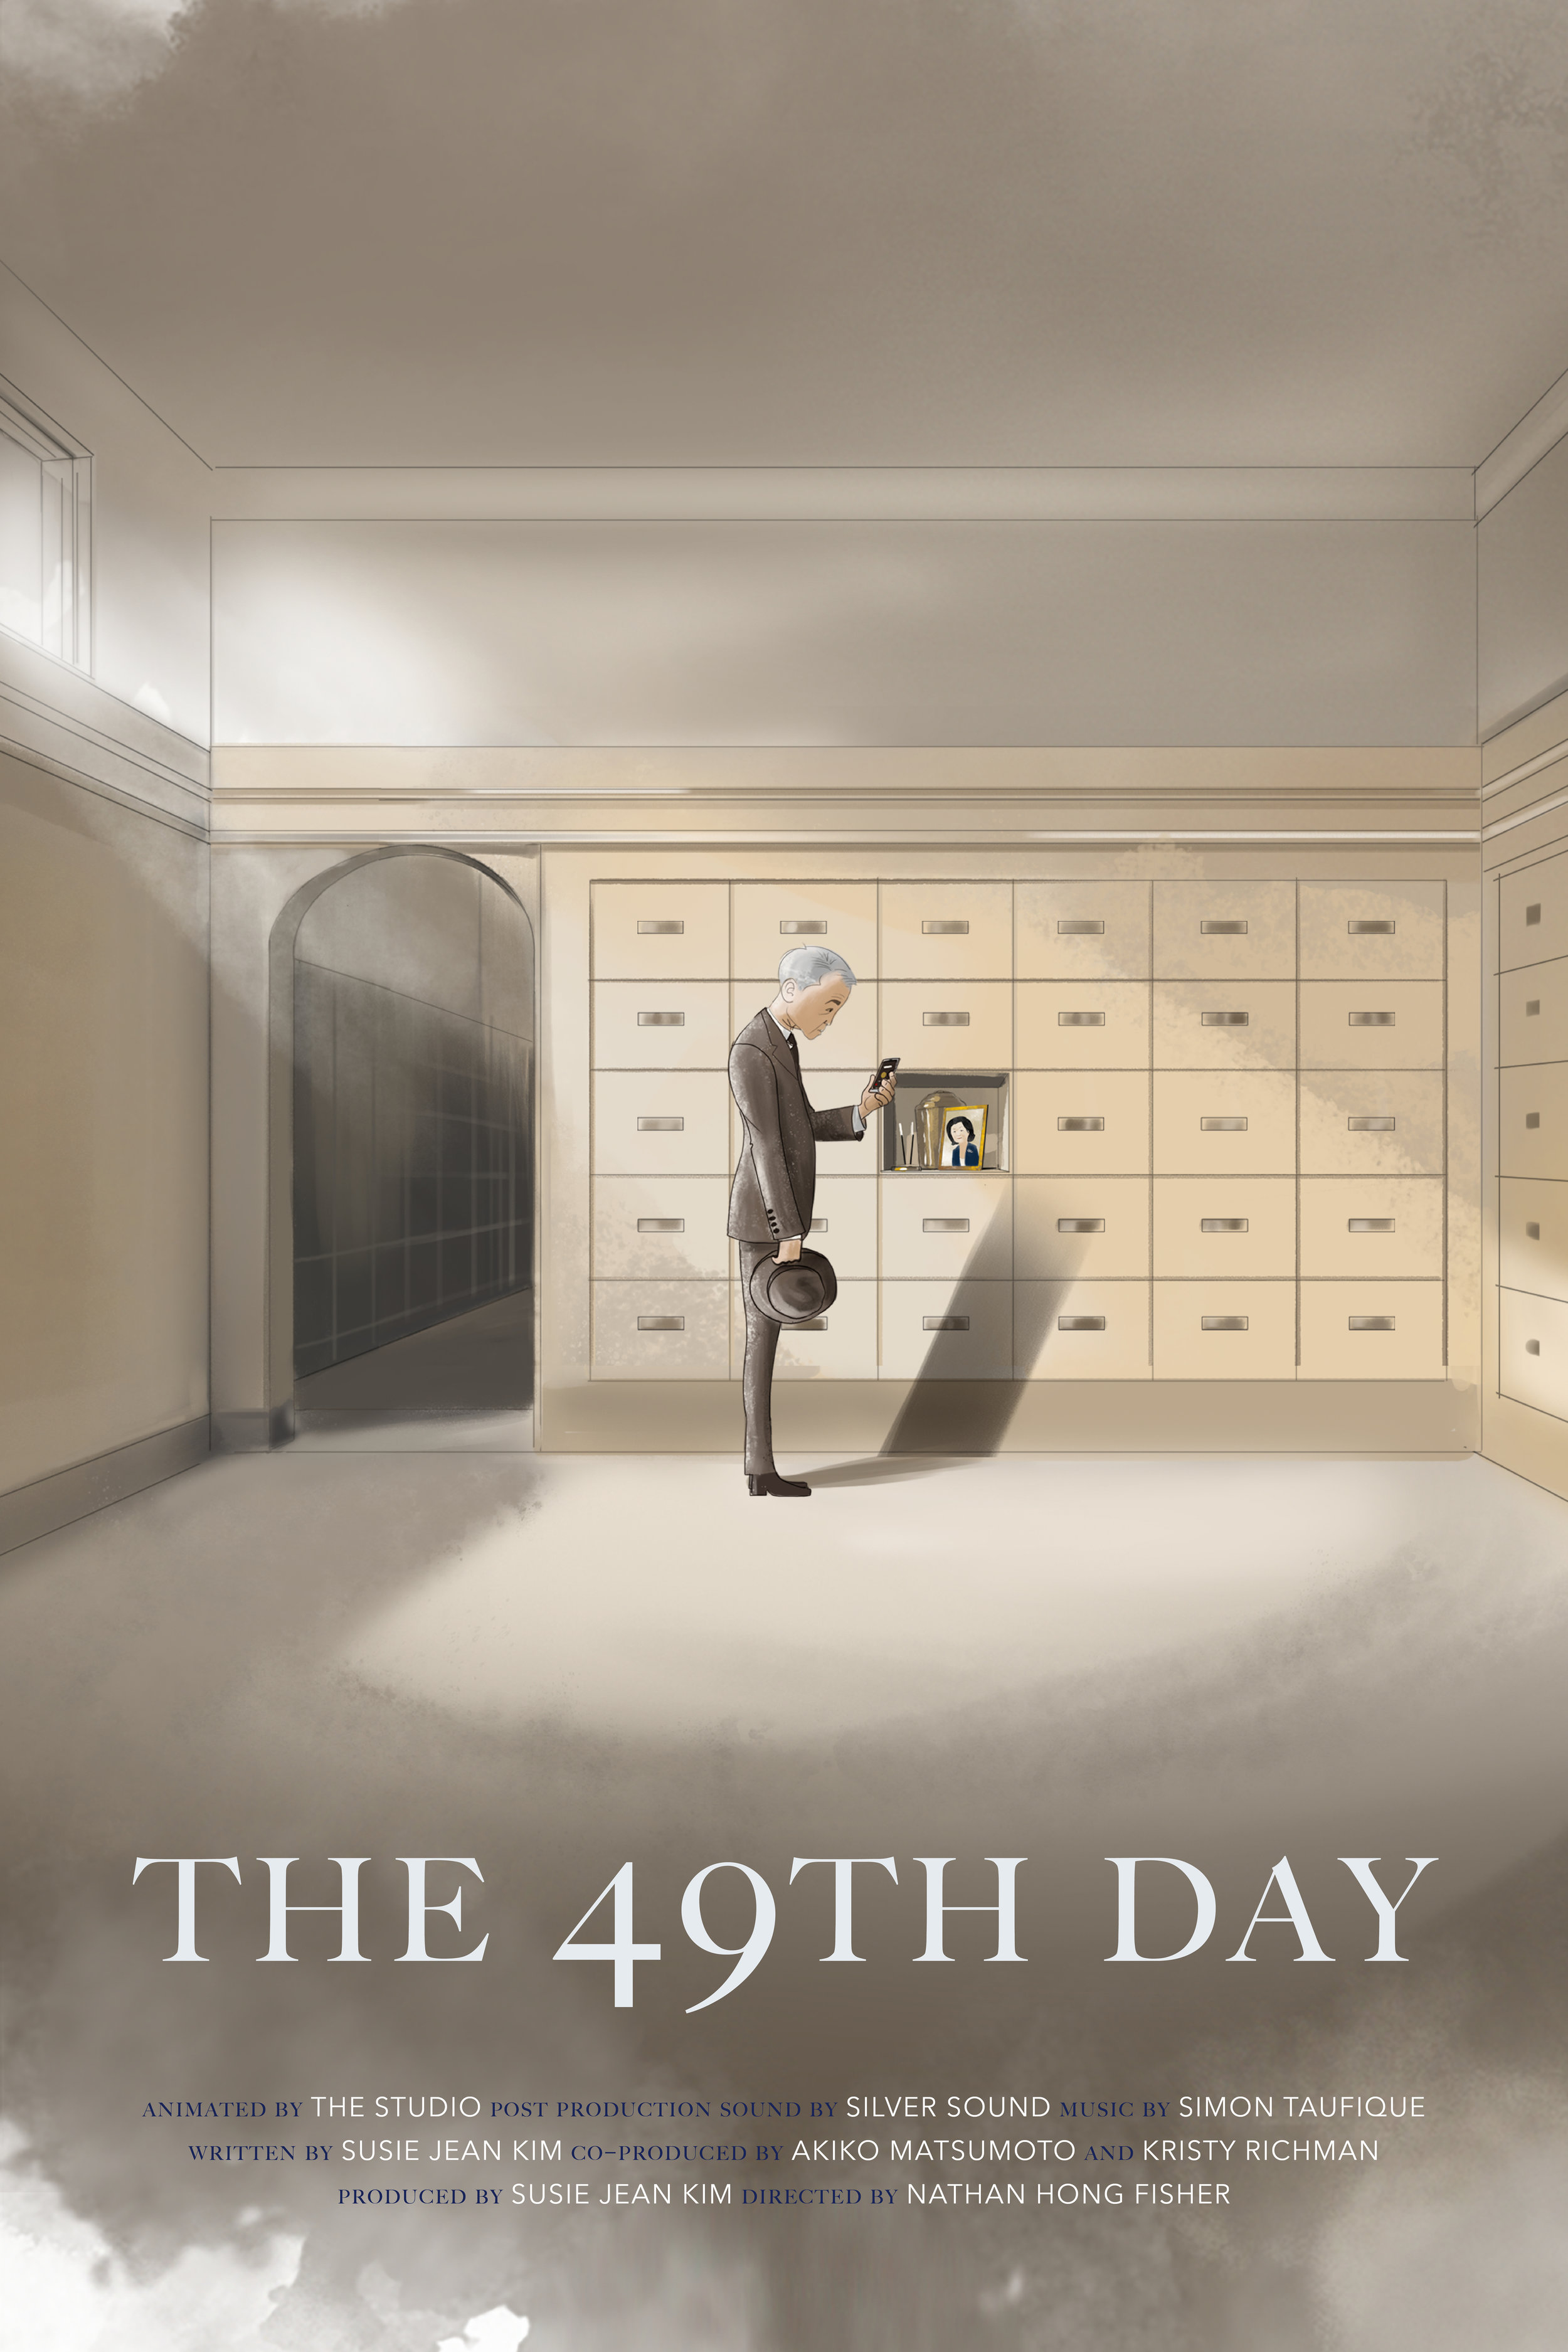 The49thDay-Poster.jpg